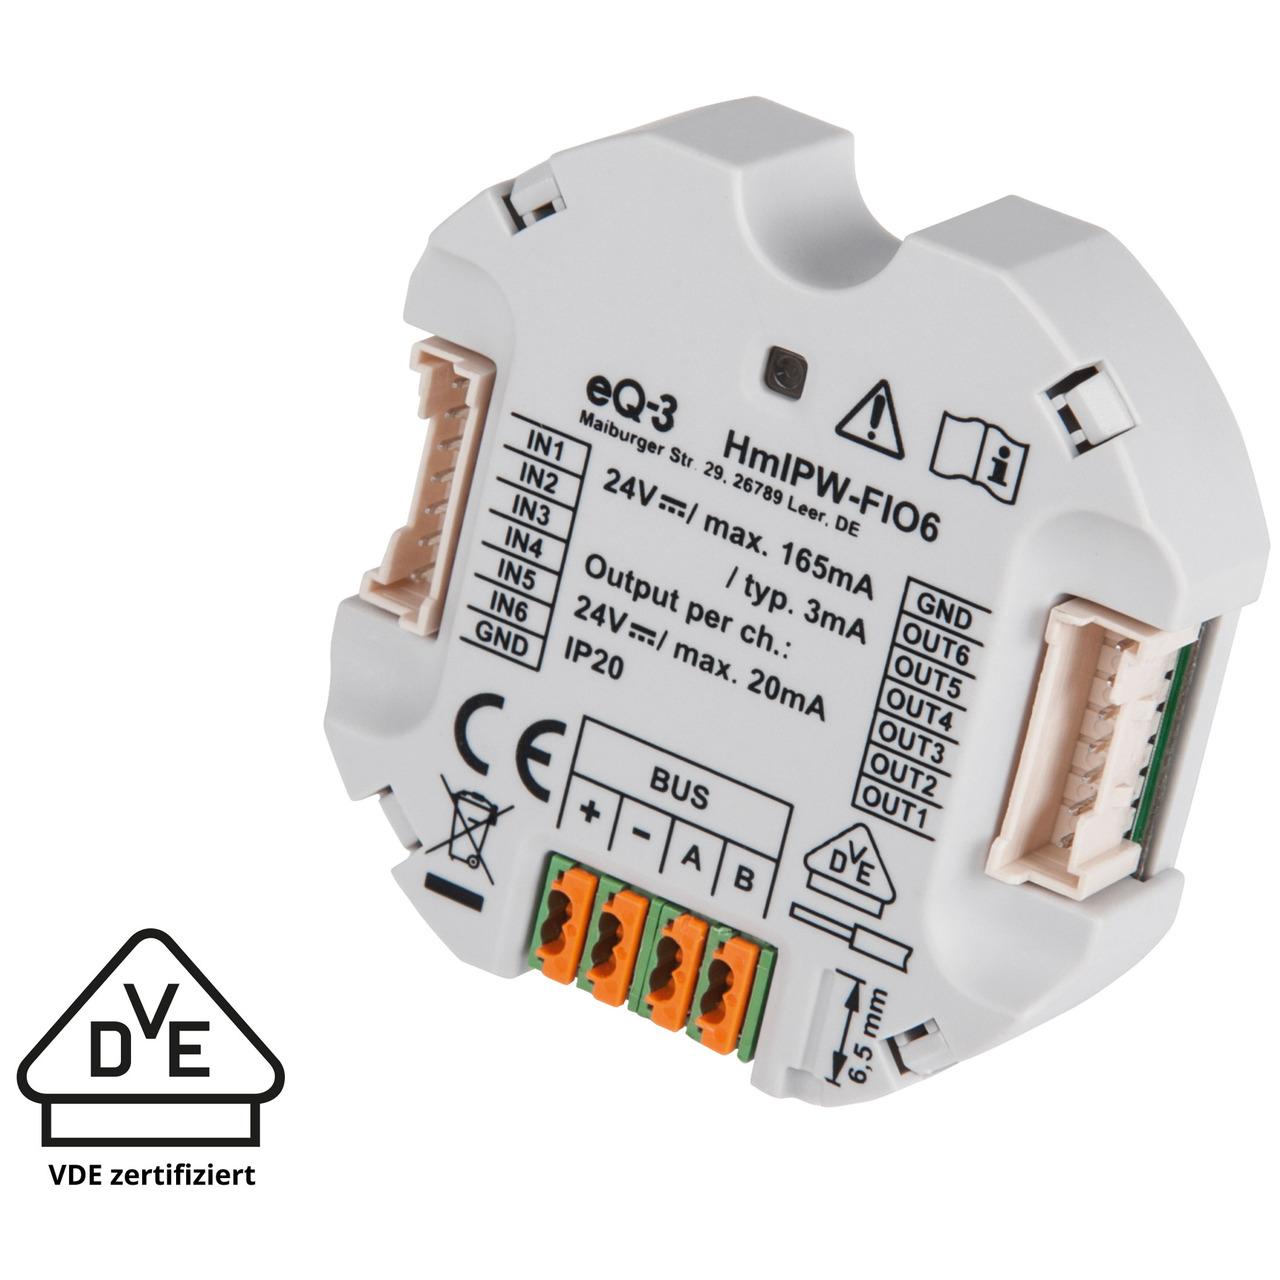 Homematic IP Wired Smart Home 6-fach-Unterputz-IO-Modul HmIPW-FIO6- VDE zertifiziert